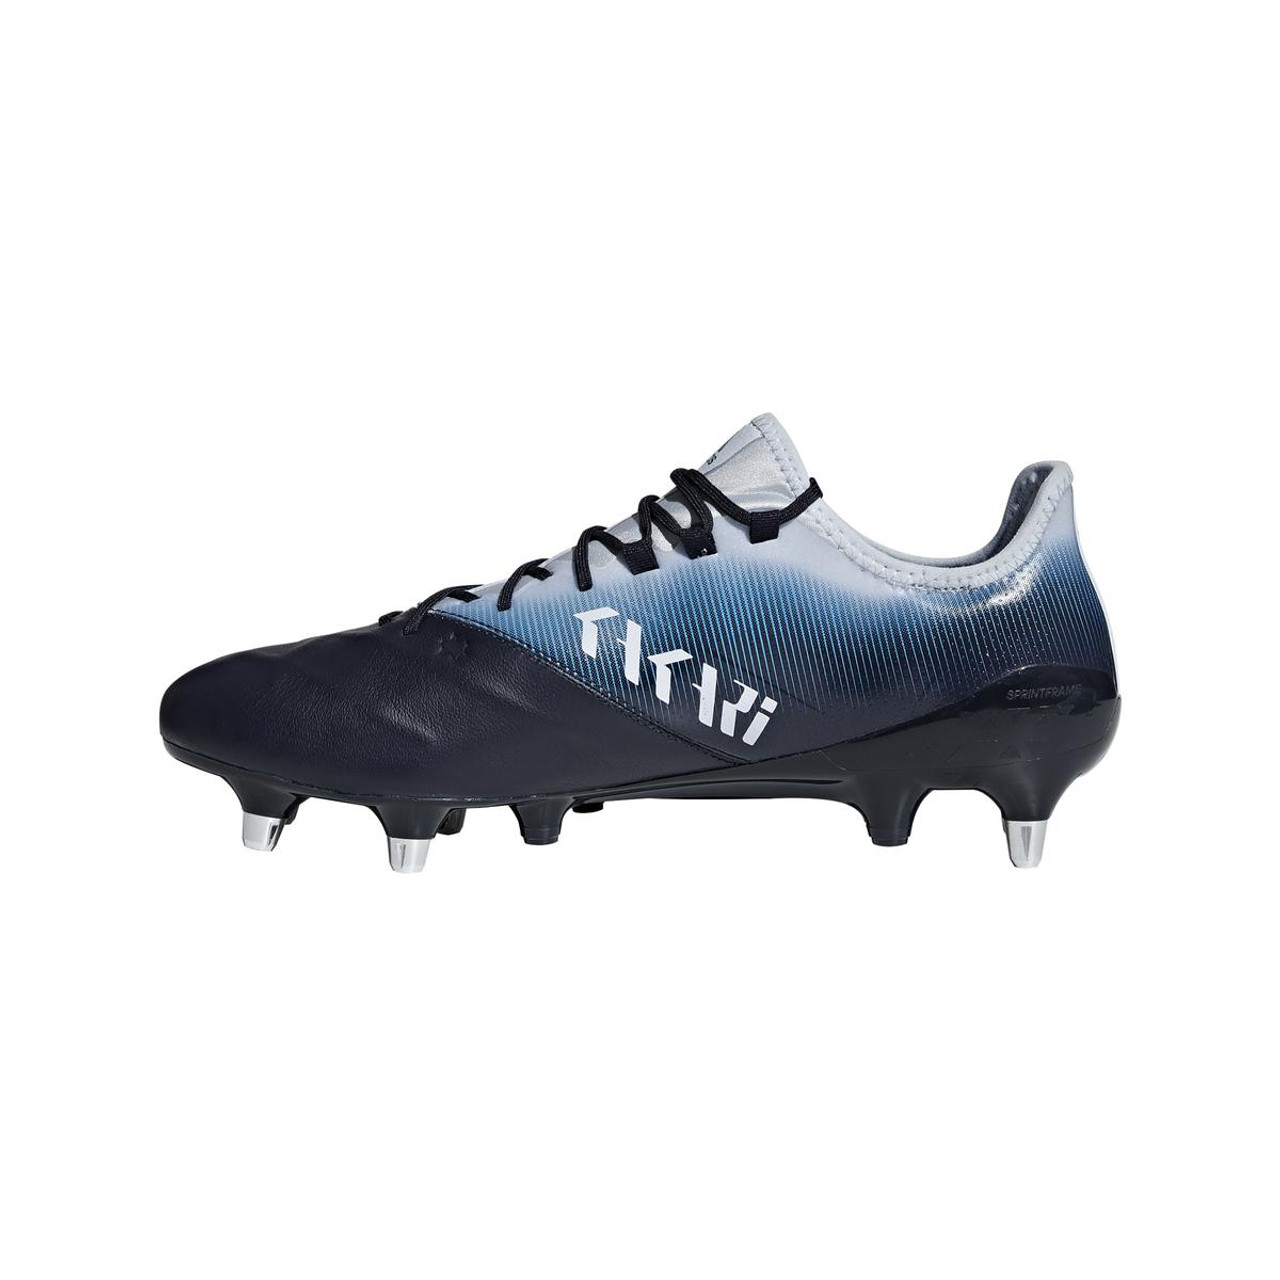 Kakari Light SG Rugby Boots Legend Ink Shock Cyan Aero Blue